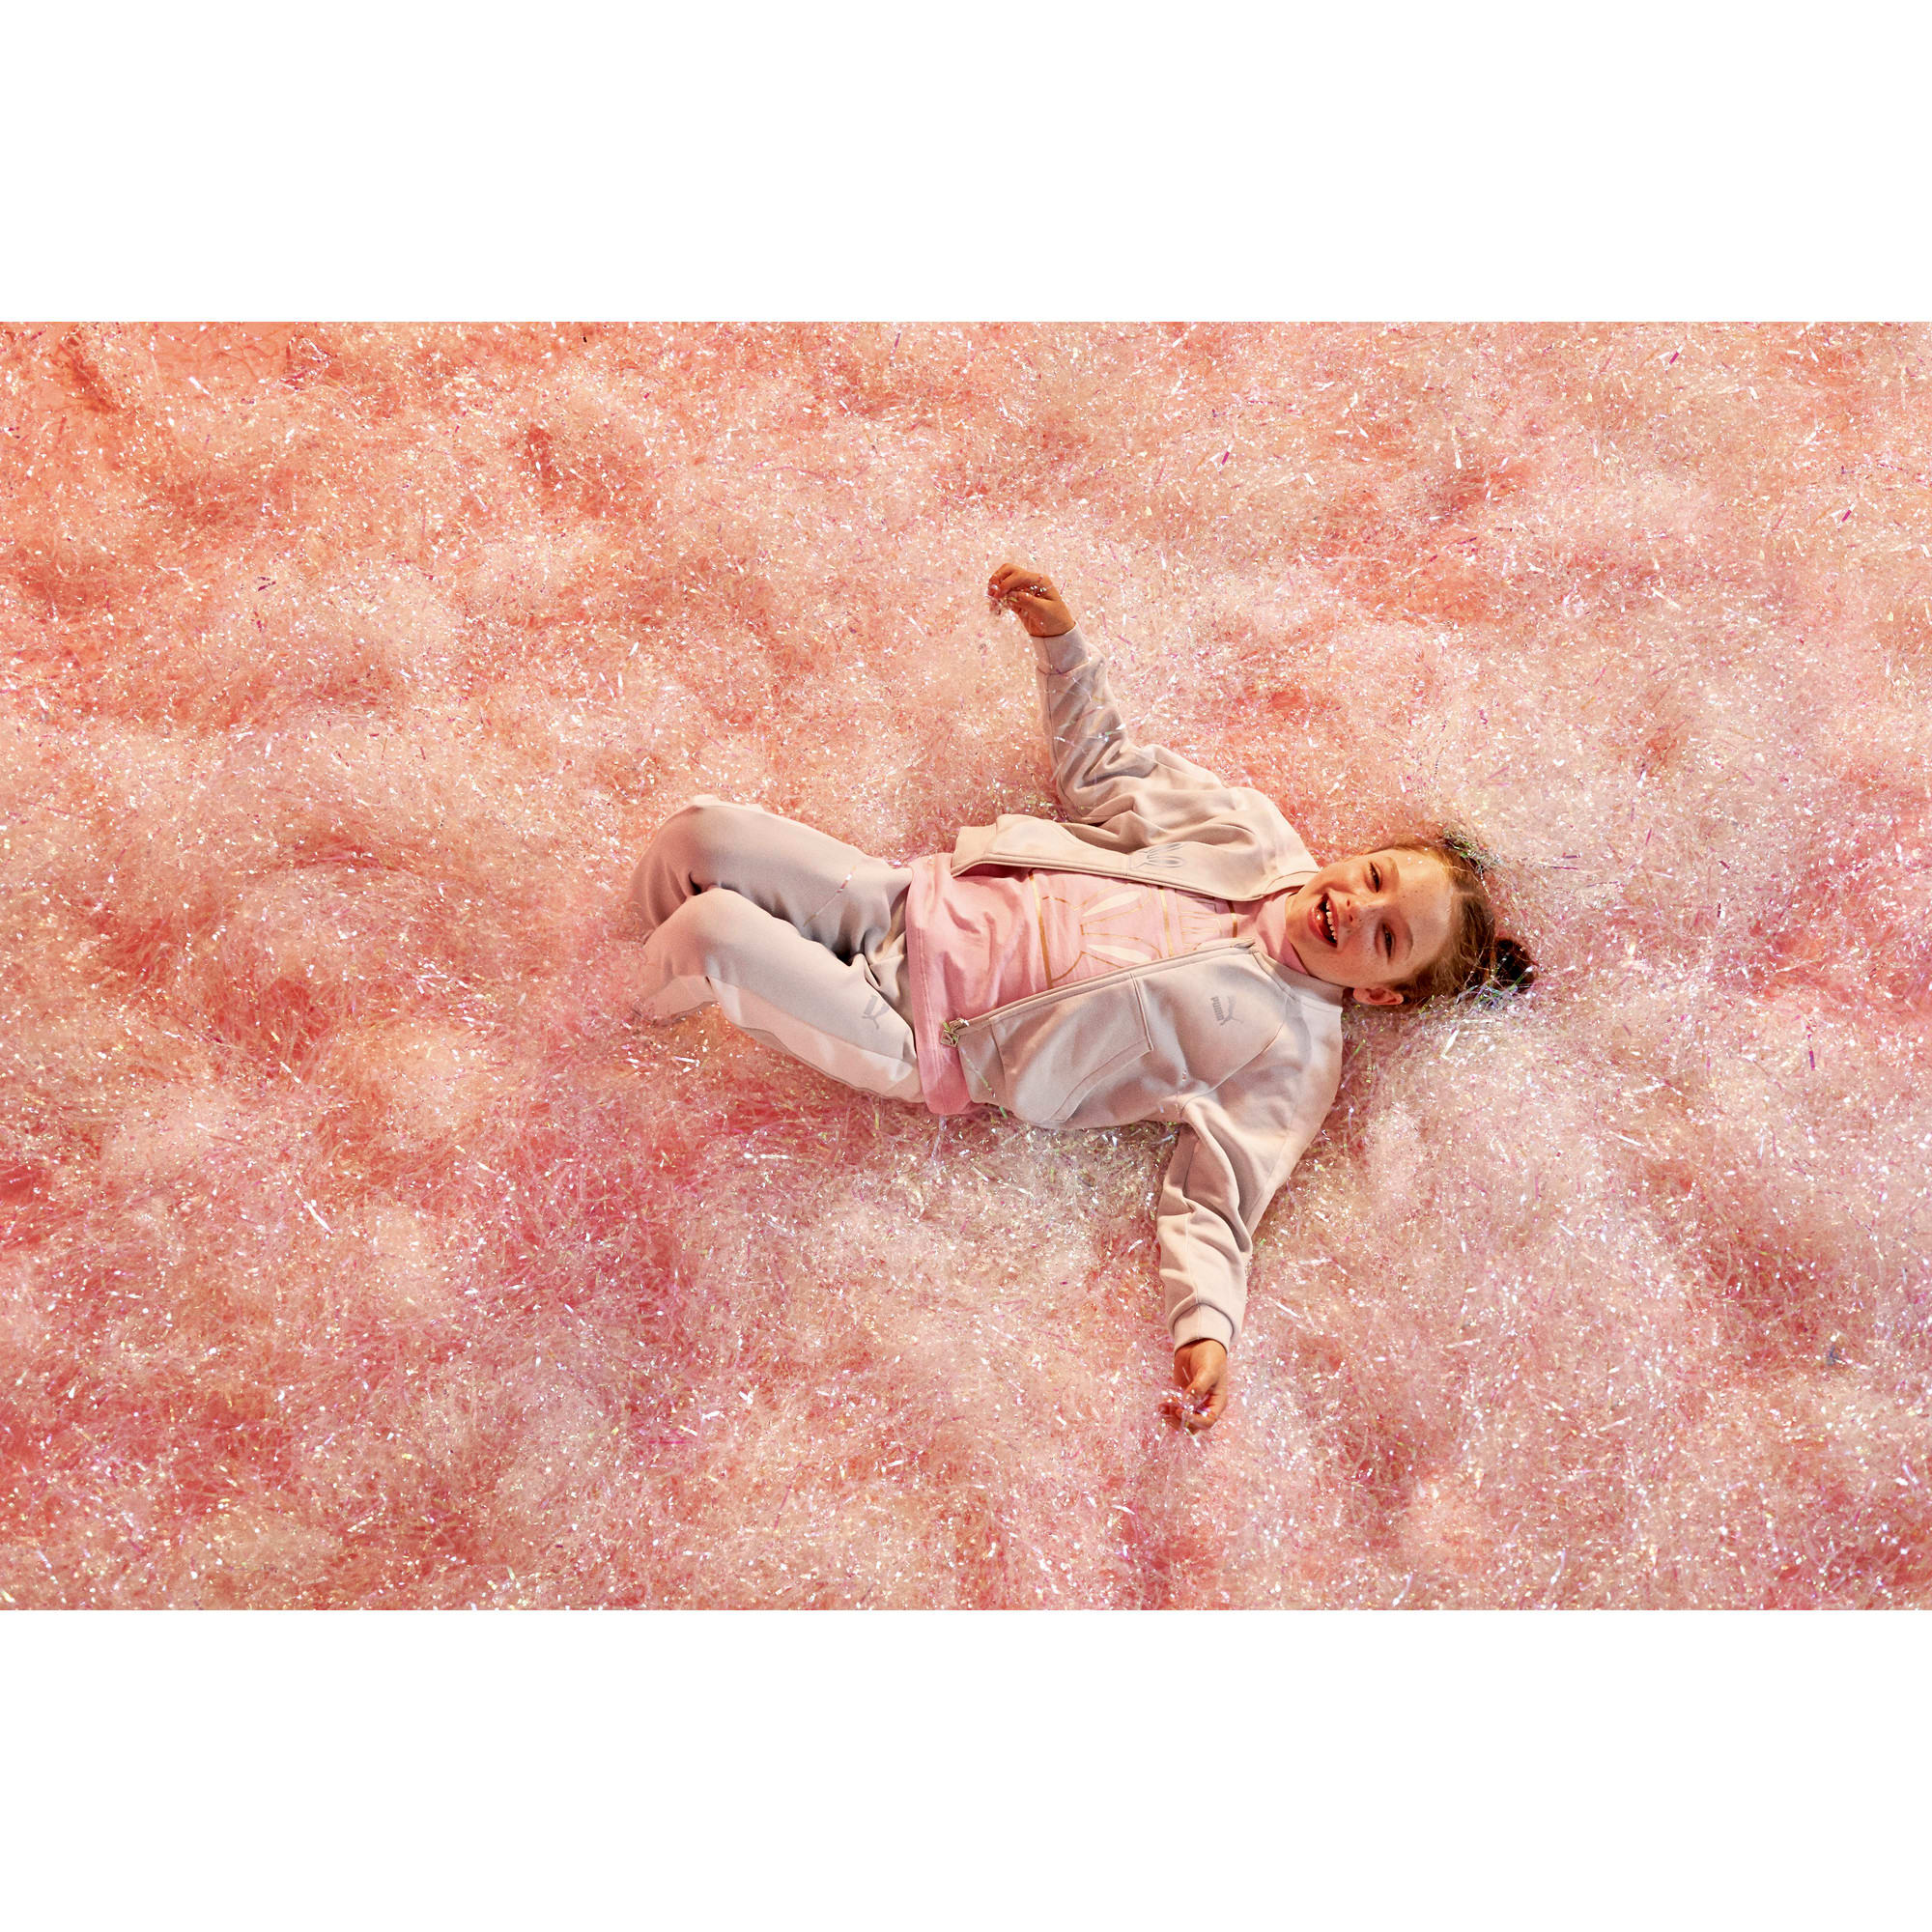 Thumbnail 4 of Infant + Toddler Easter Set, Glacier Gray, medium